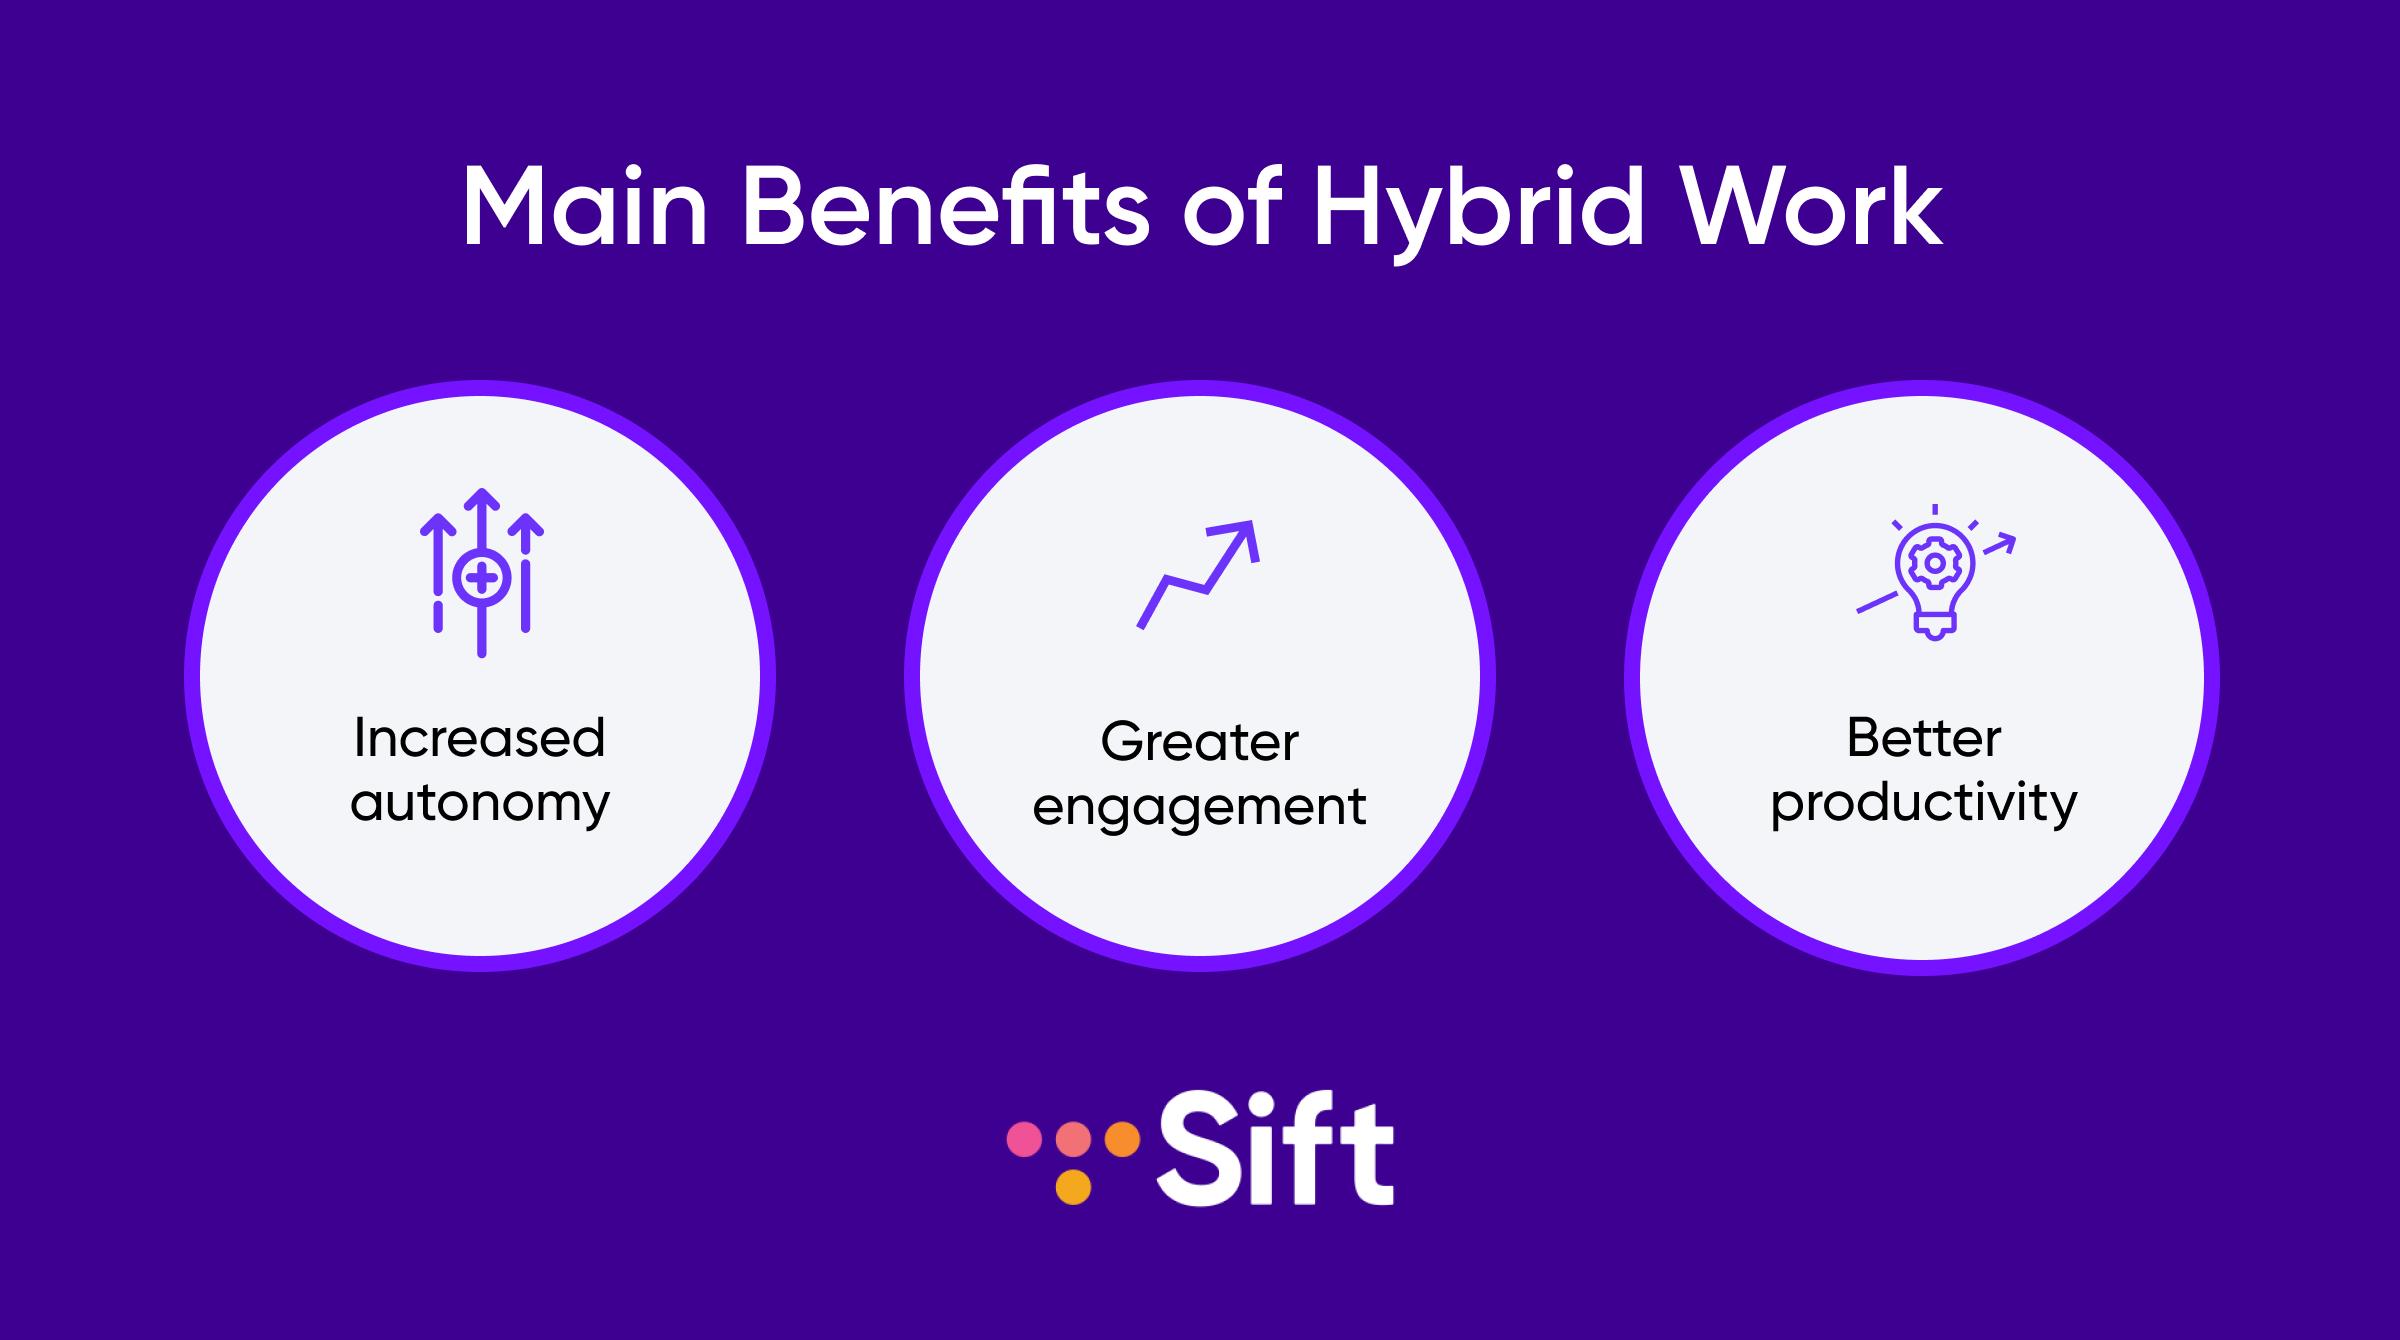 Main benefits of hybrid work